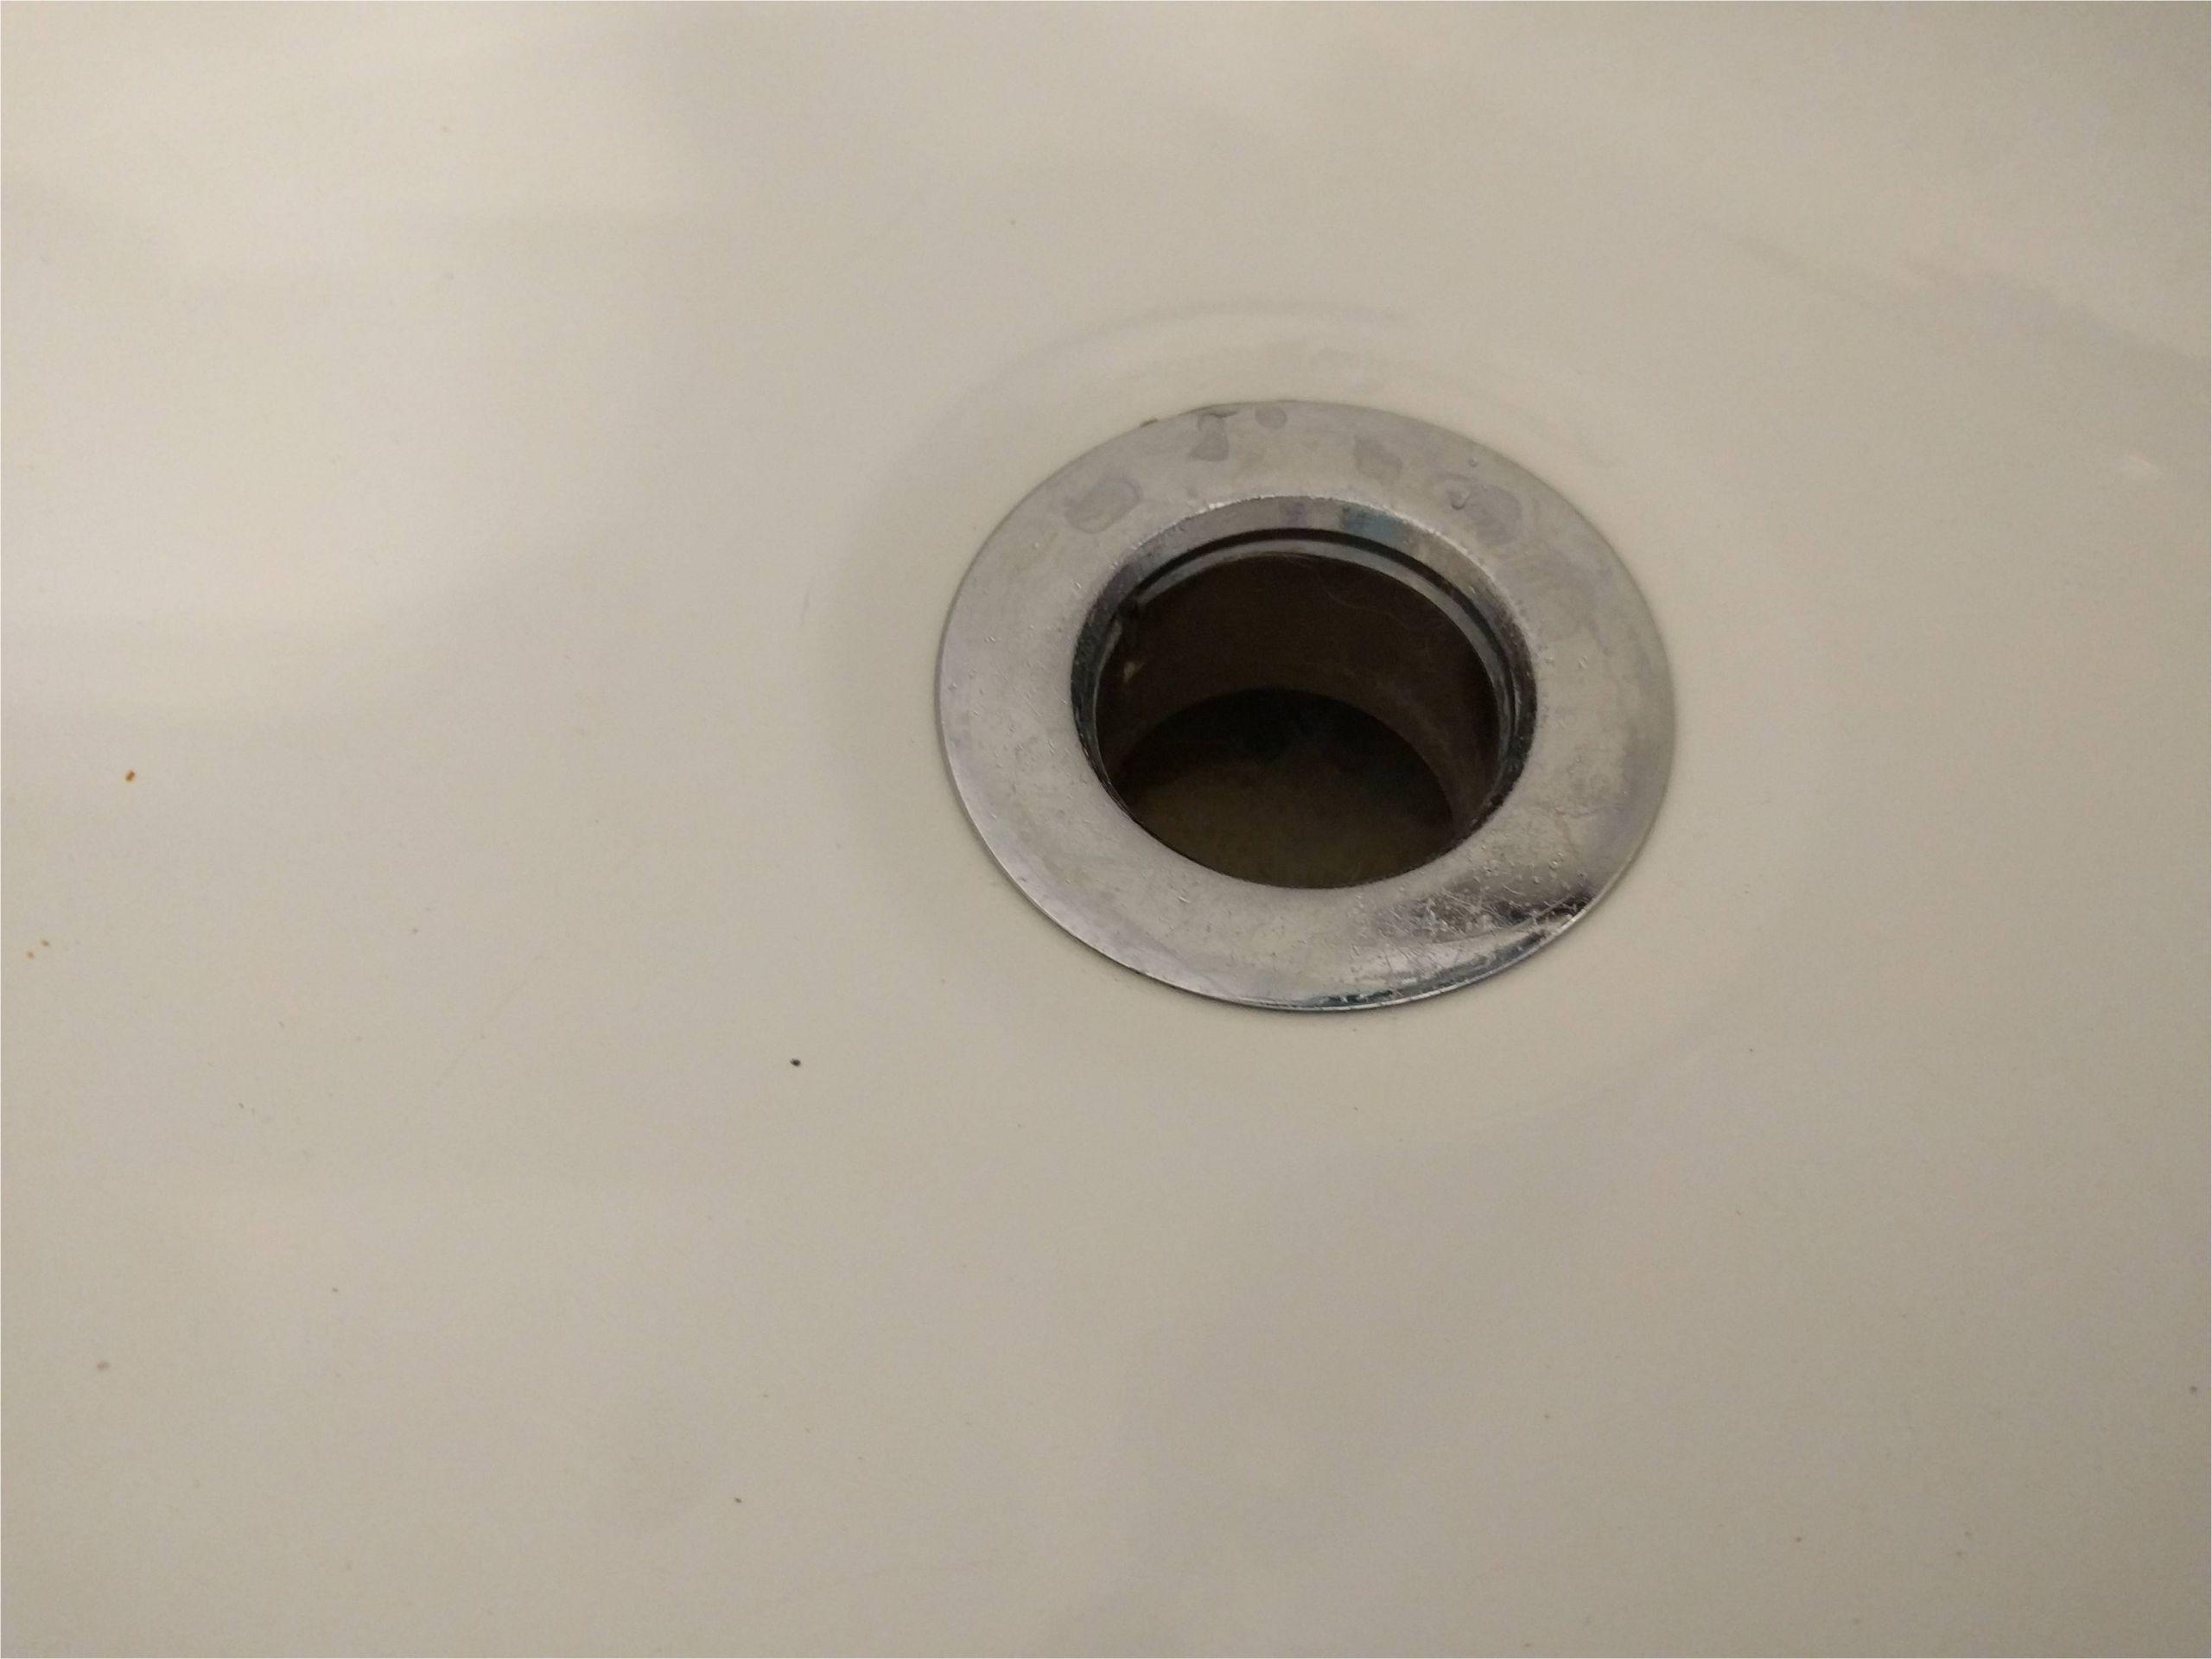 striking tub drain design for modern bathroom decor